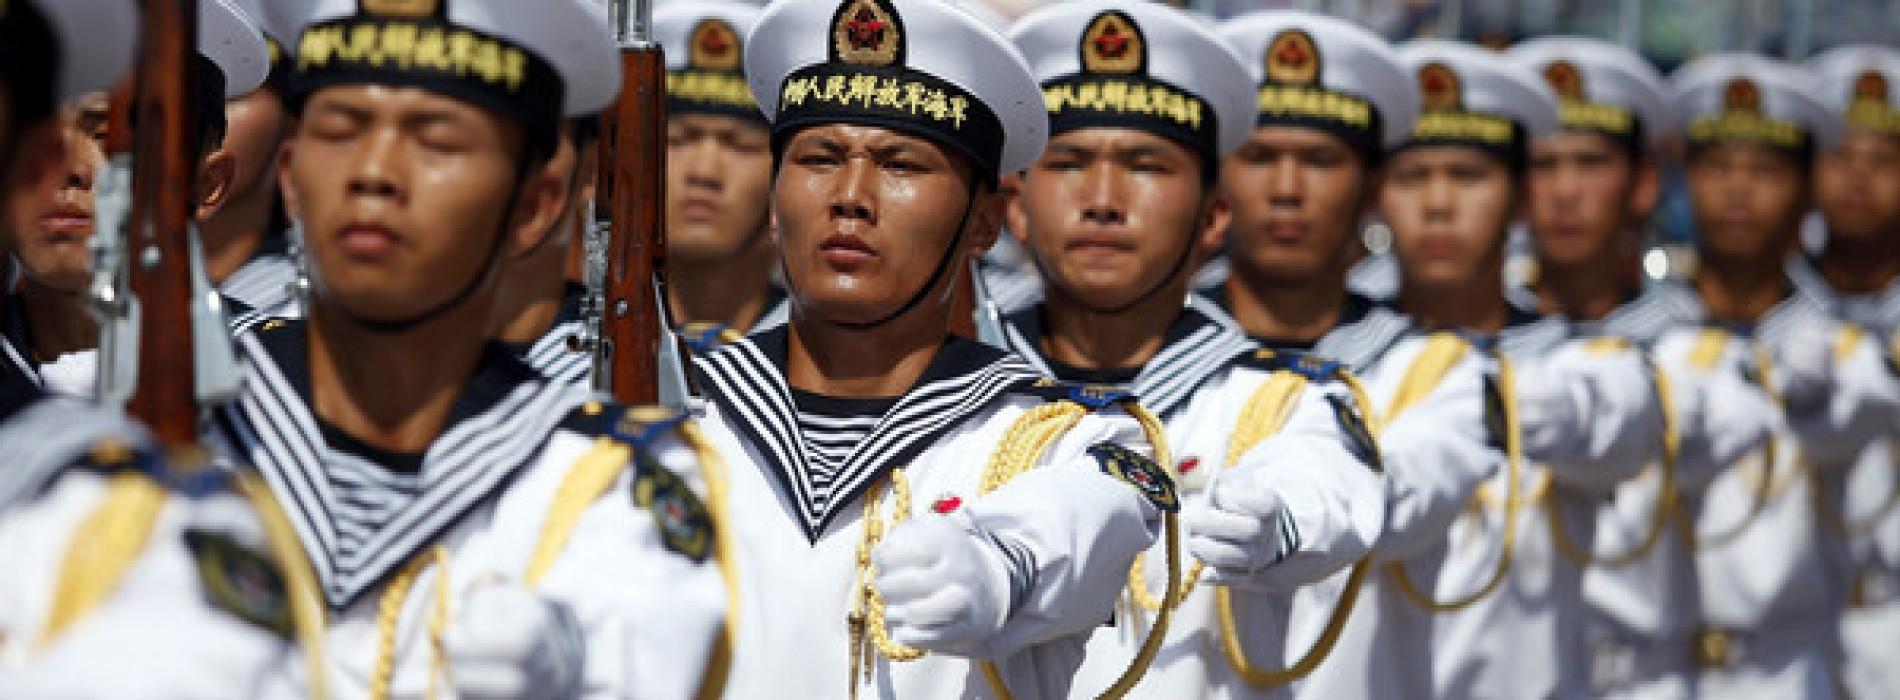 La Cina apre la prima base navale a Gibuti